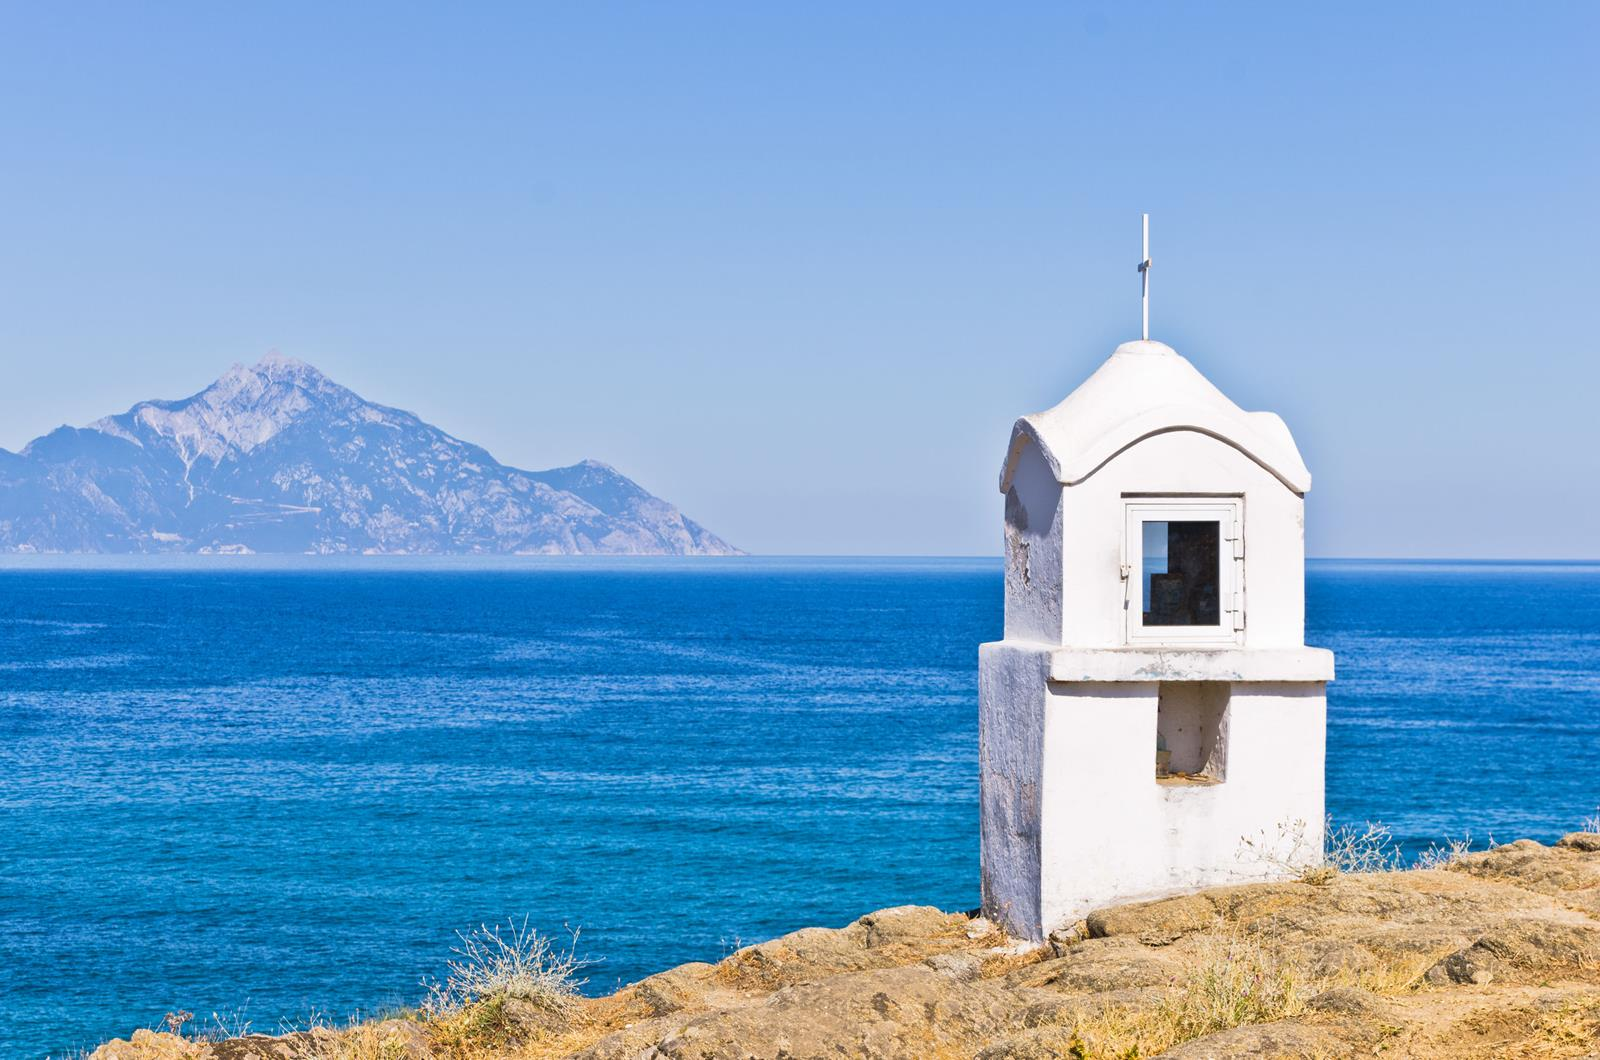 sarti greece - Epohikon Studios